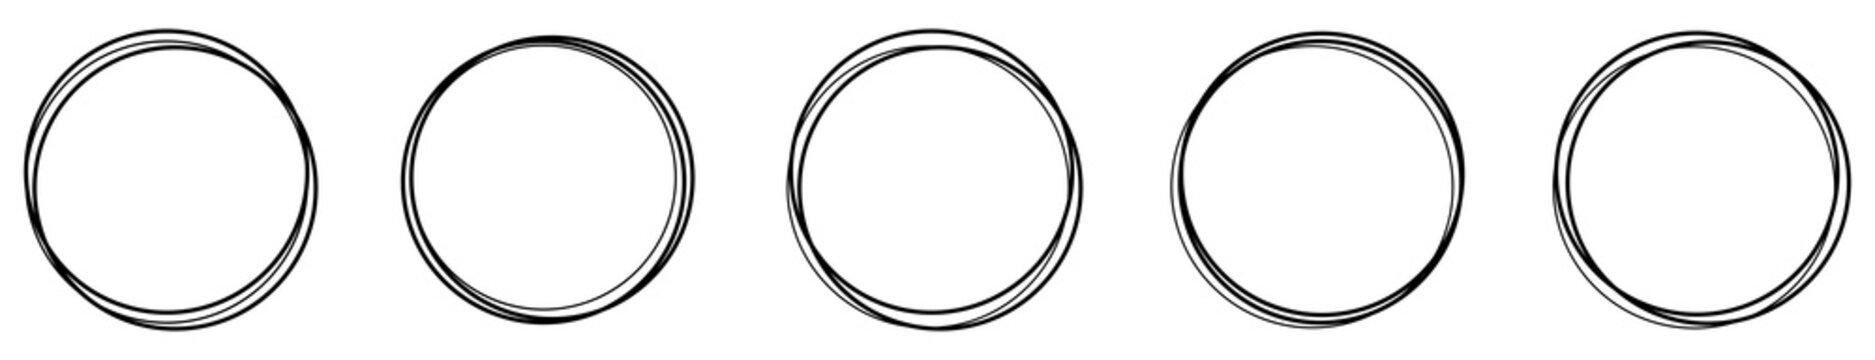 Circle line shape and border hand drawn. Vector